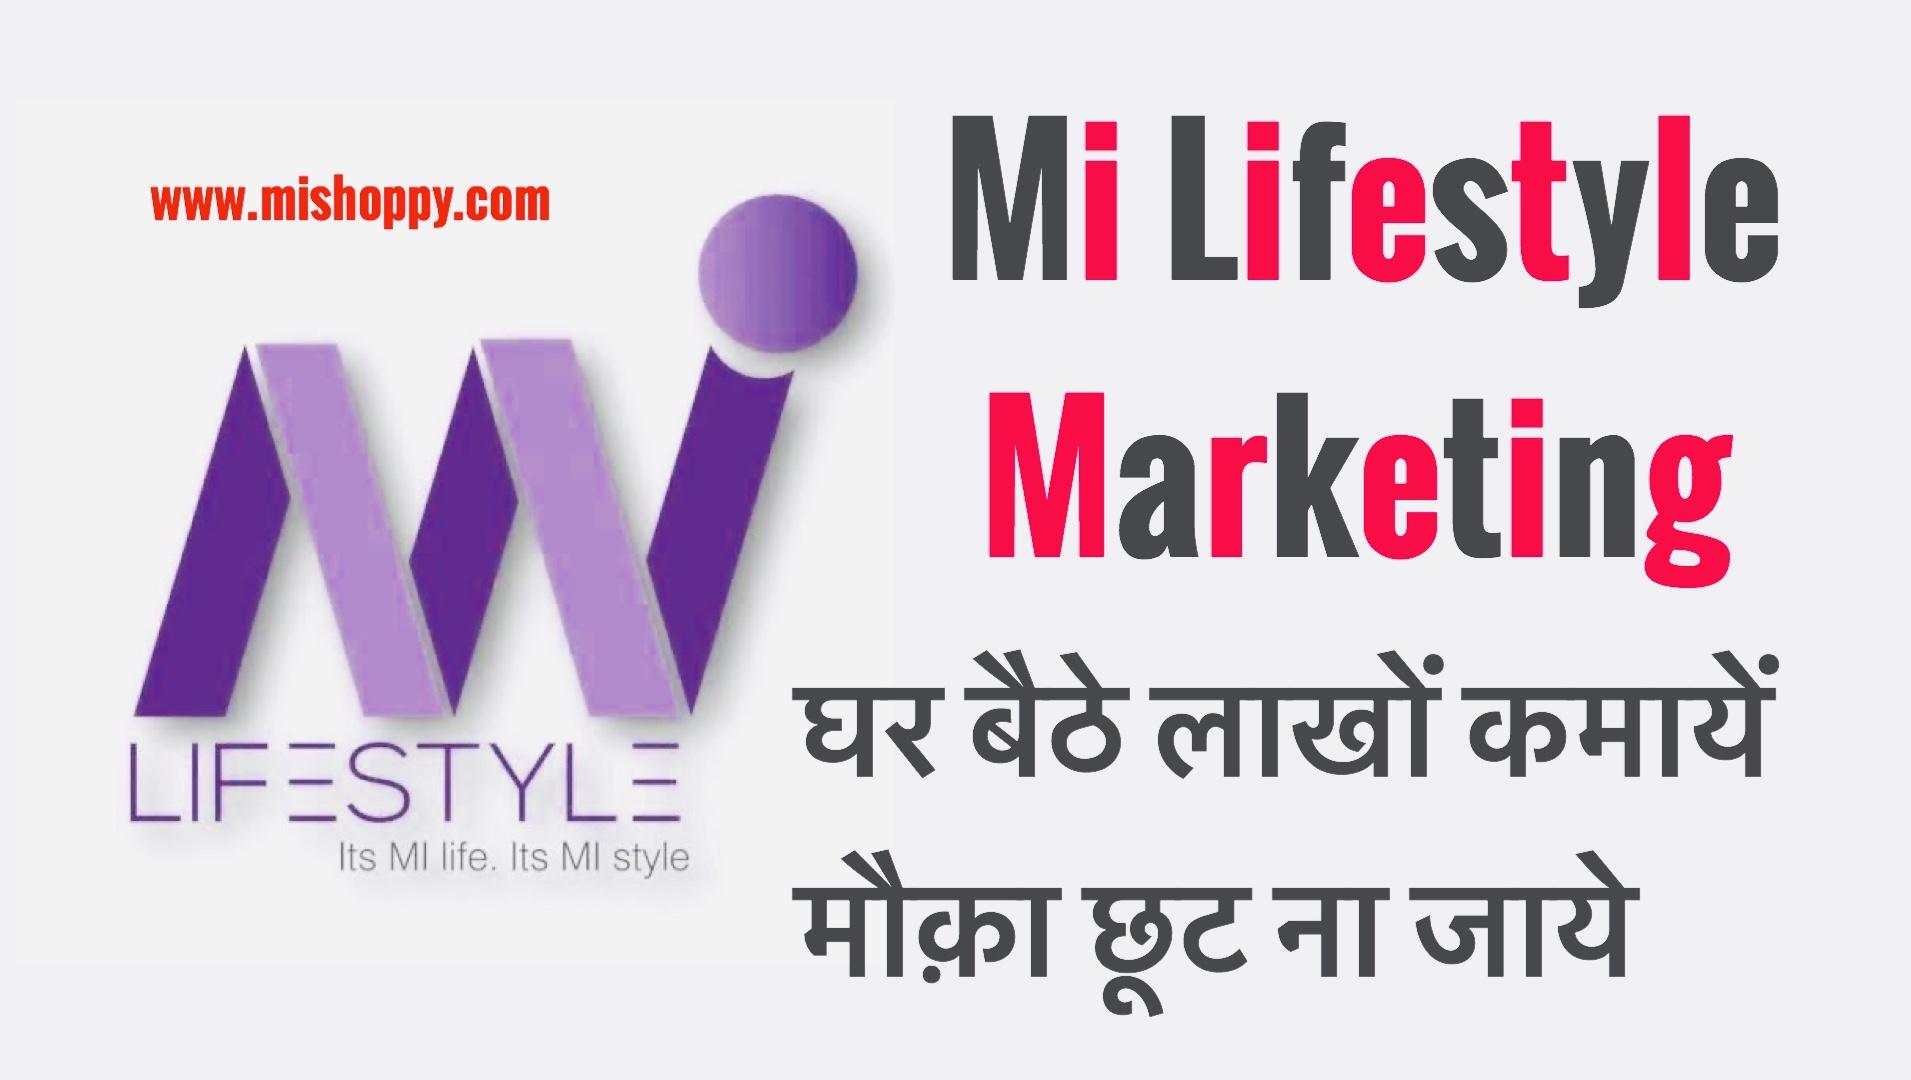 Mi lifestyle marketing Hindi